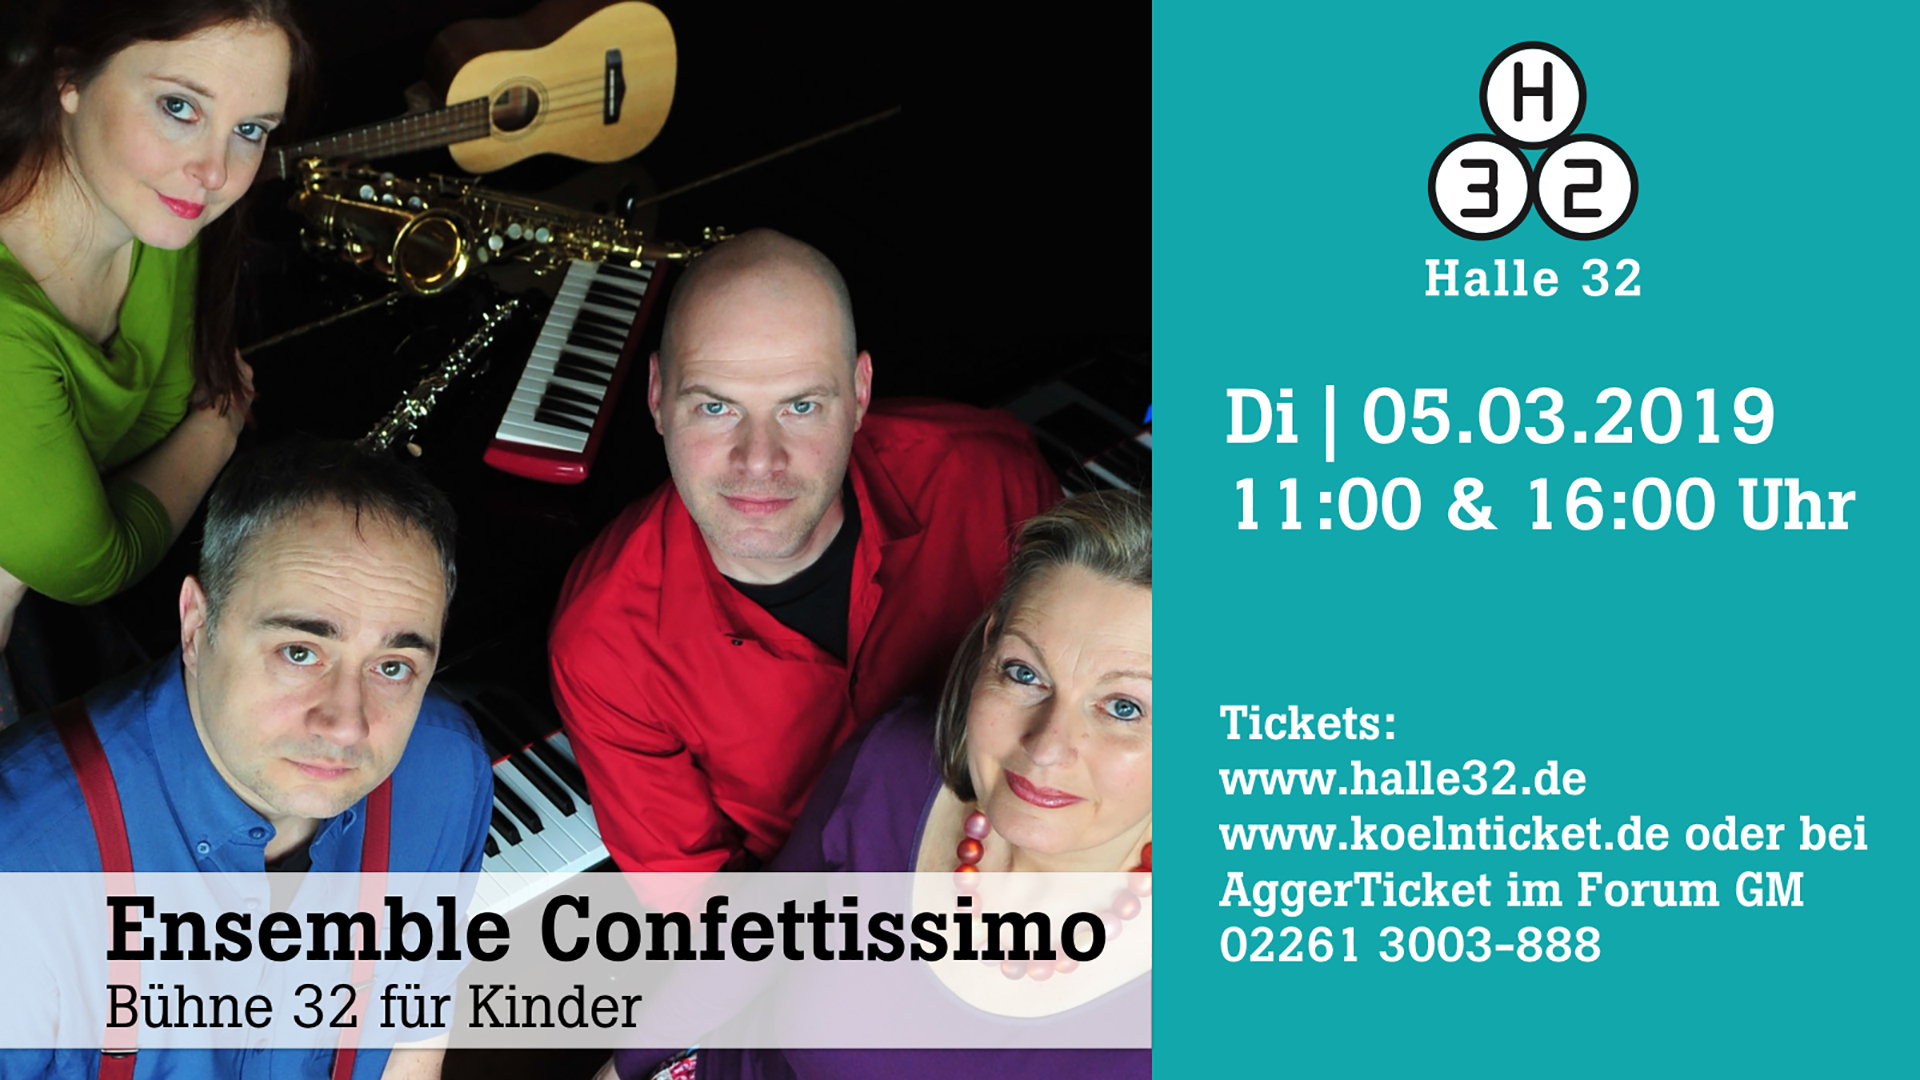 Halle 32 | Ensemble Confettissimo